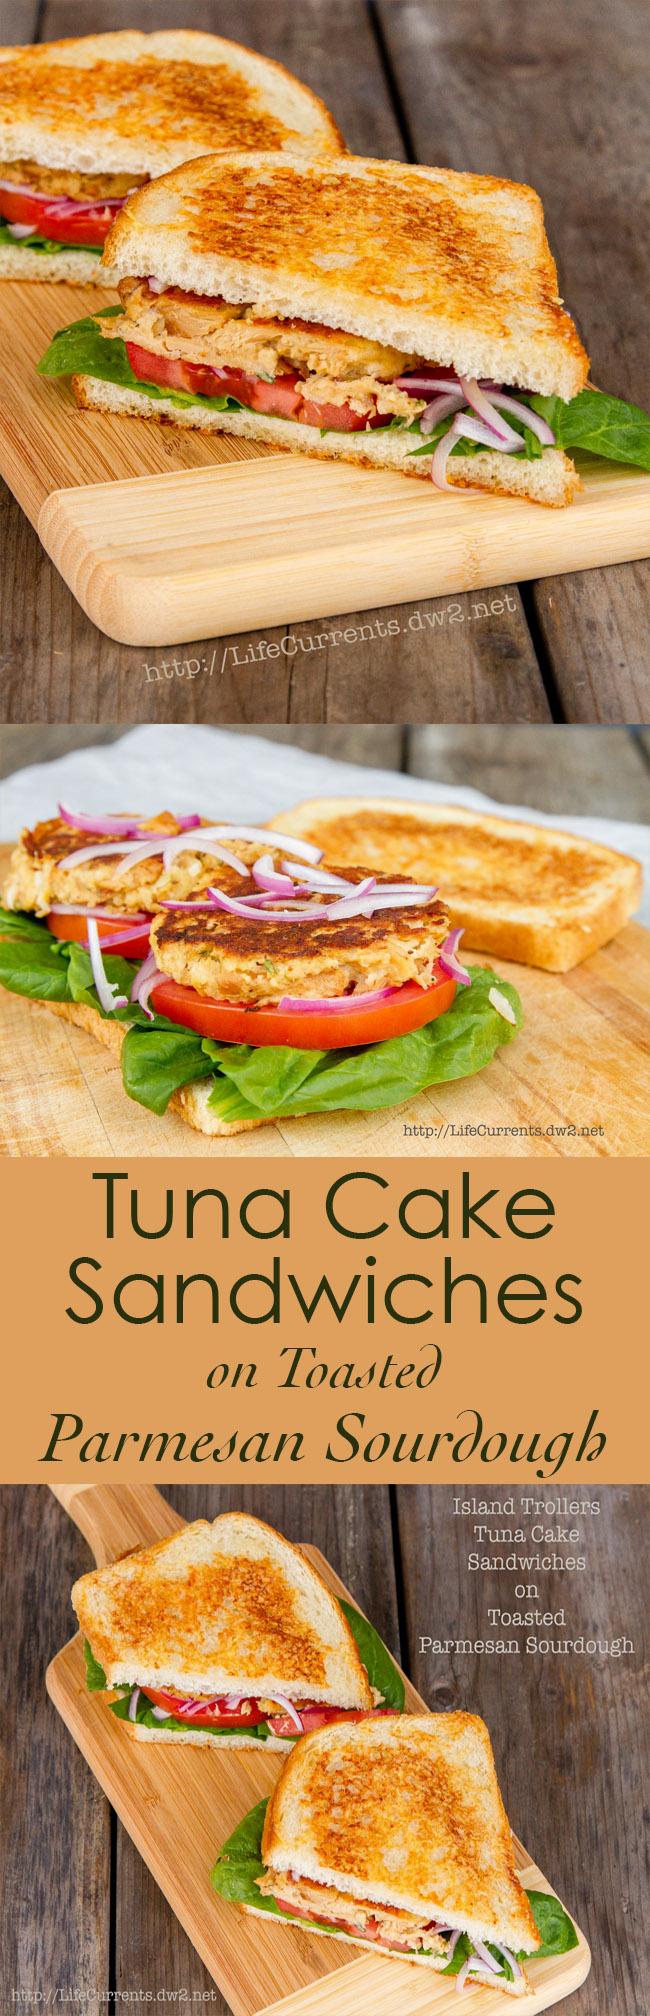 Island Trollers Tuna Cake Sandwiches on Toasted Parmesan Sourdough Recipe